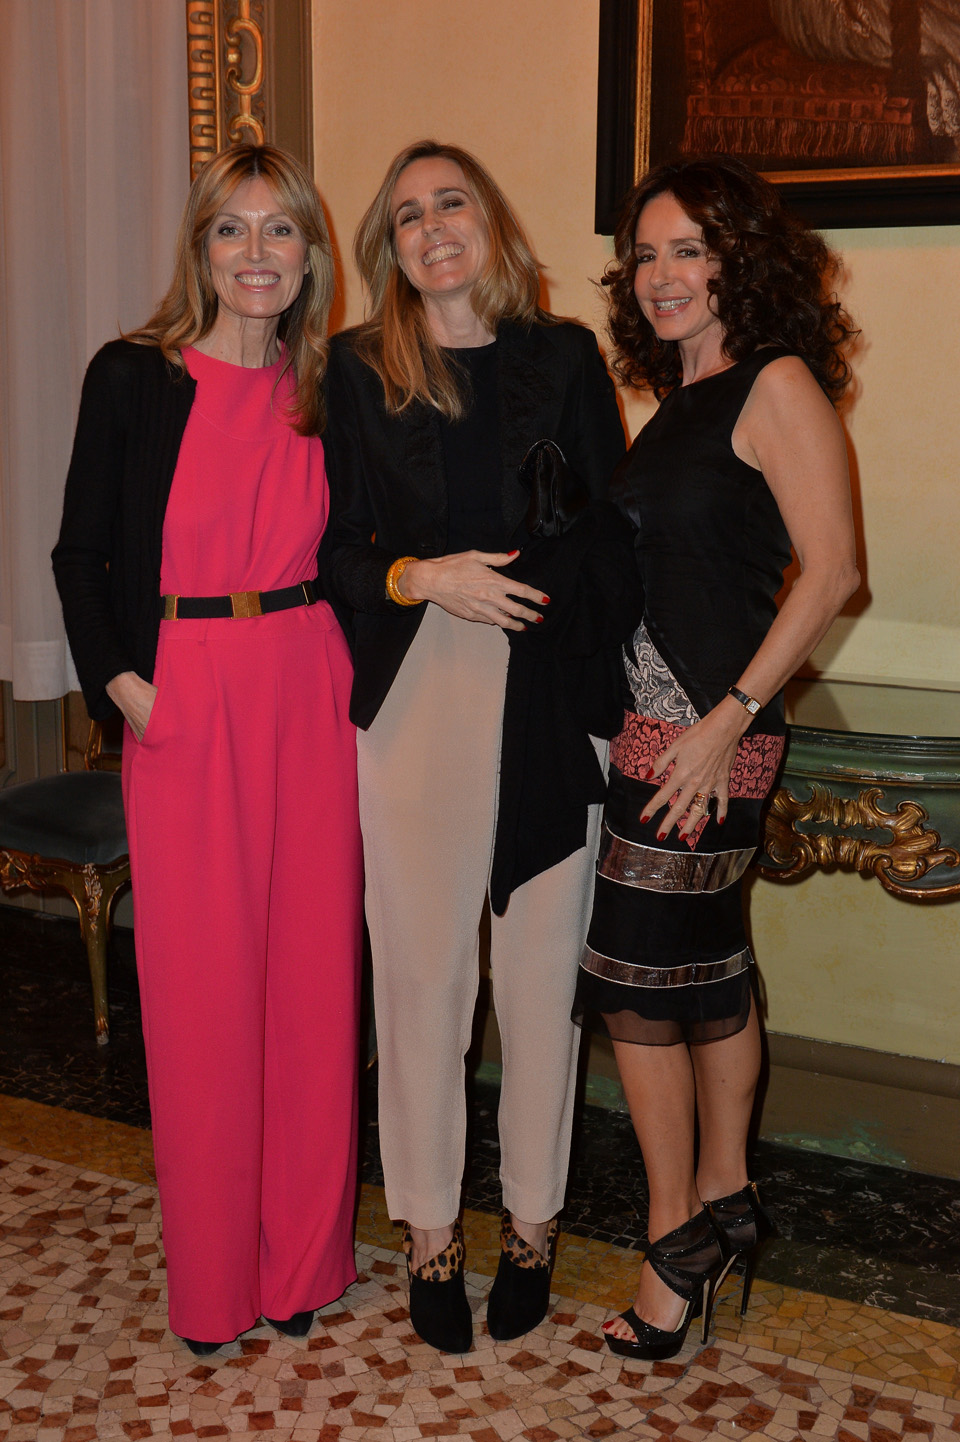 Gabriella Dompè, Isabelle Clavarino, Umberta Beretta